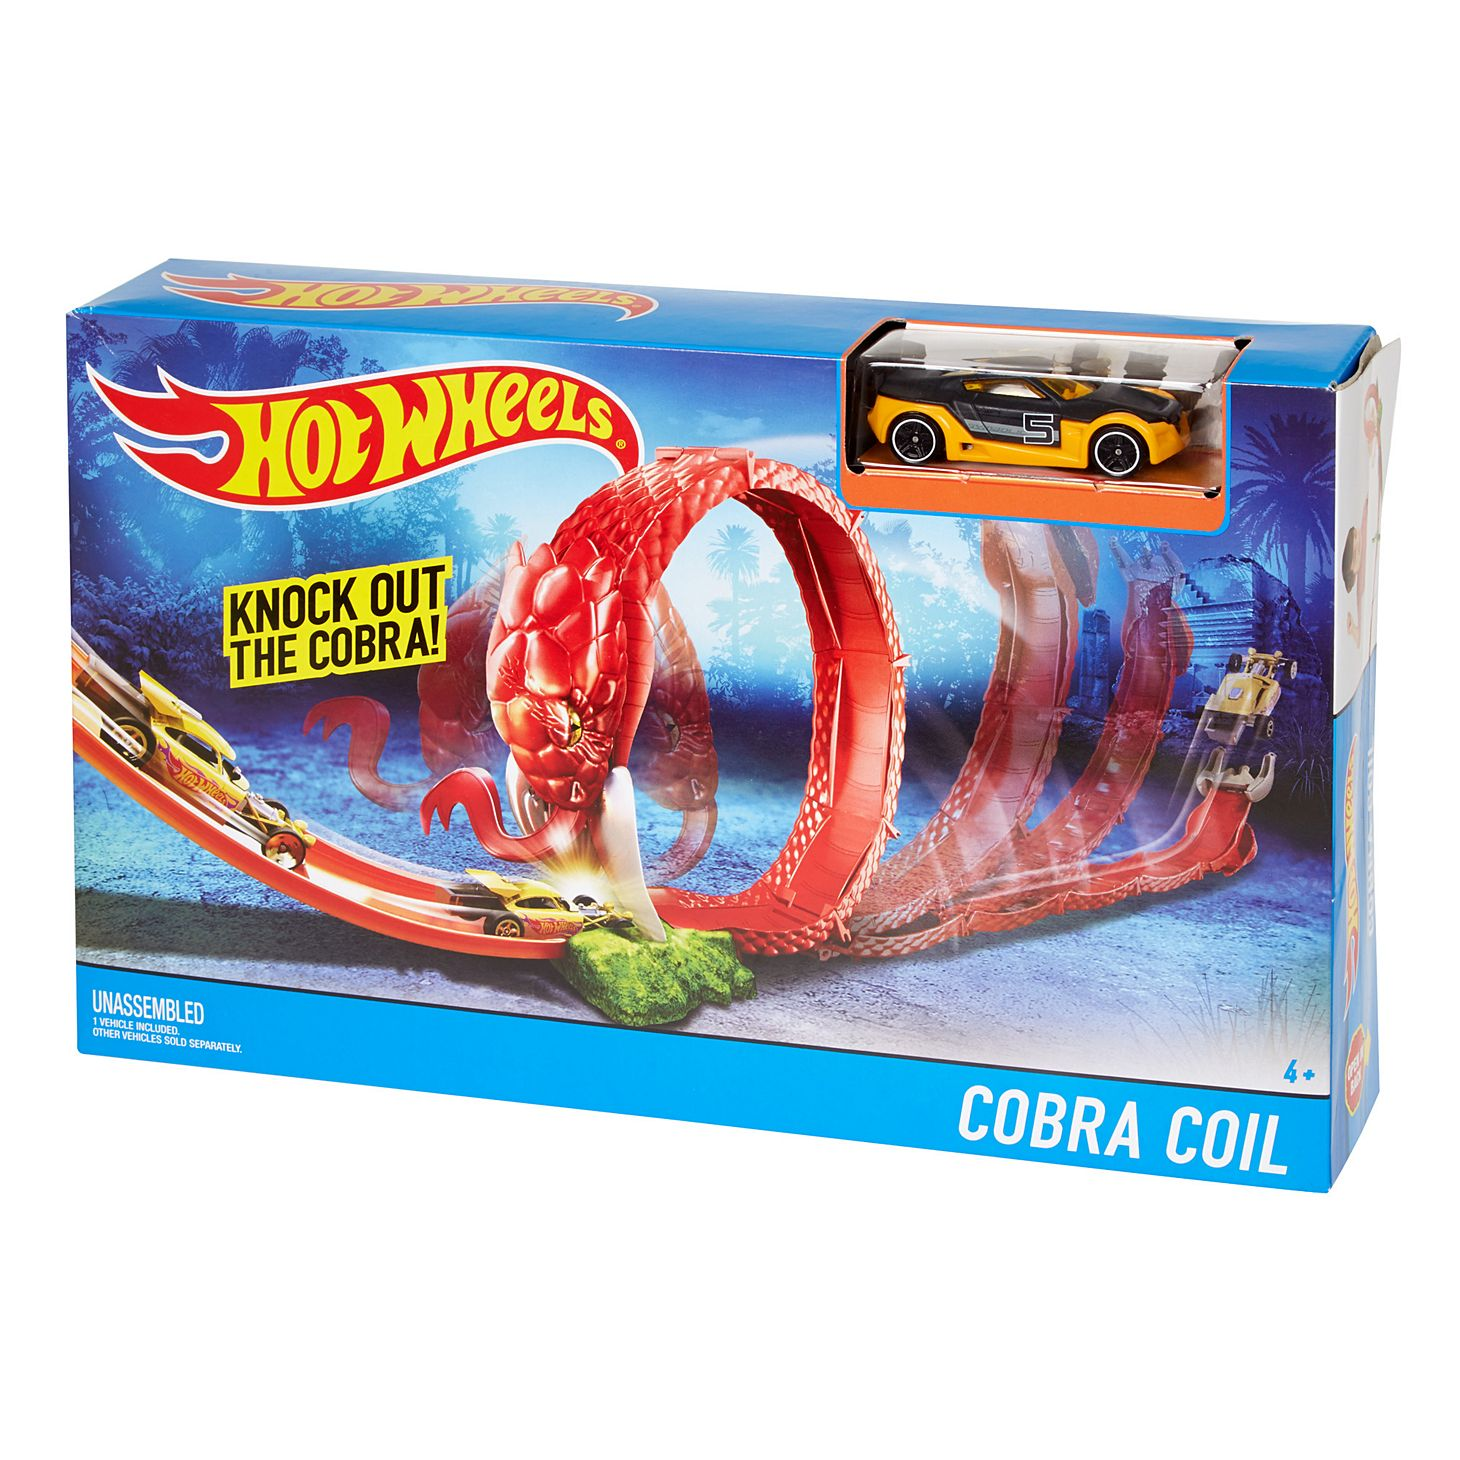 DWK94-Cobra-Coil-1